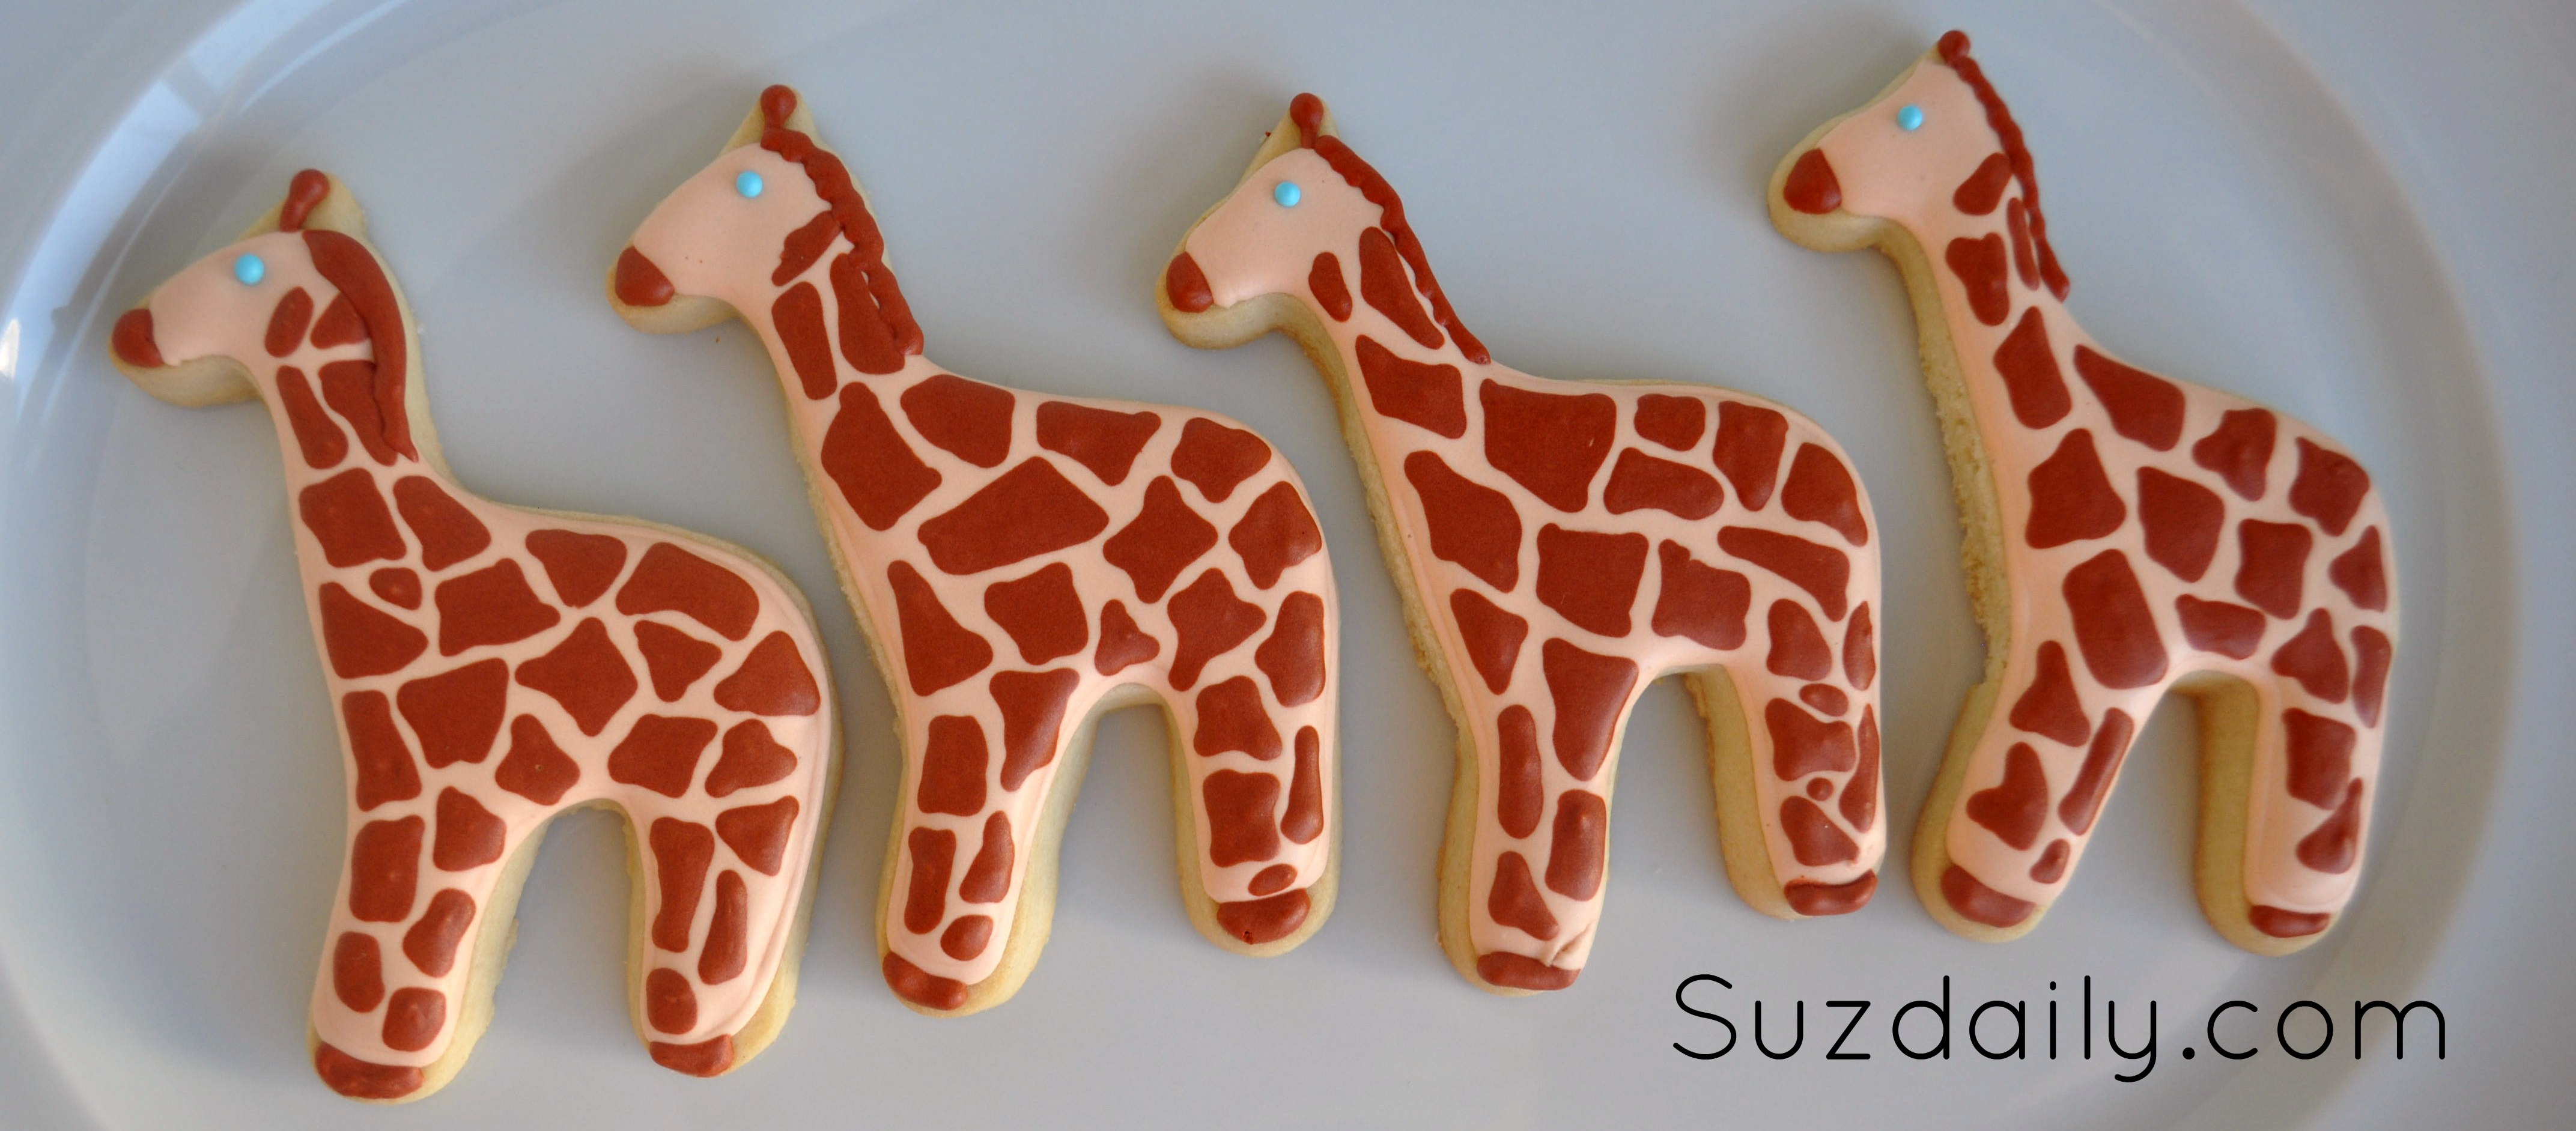 How to make a Giraffe Cookie